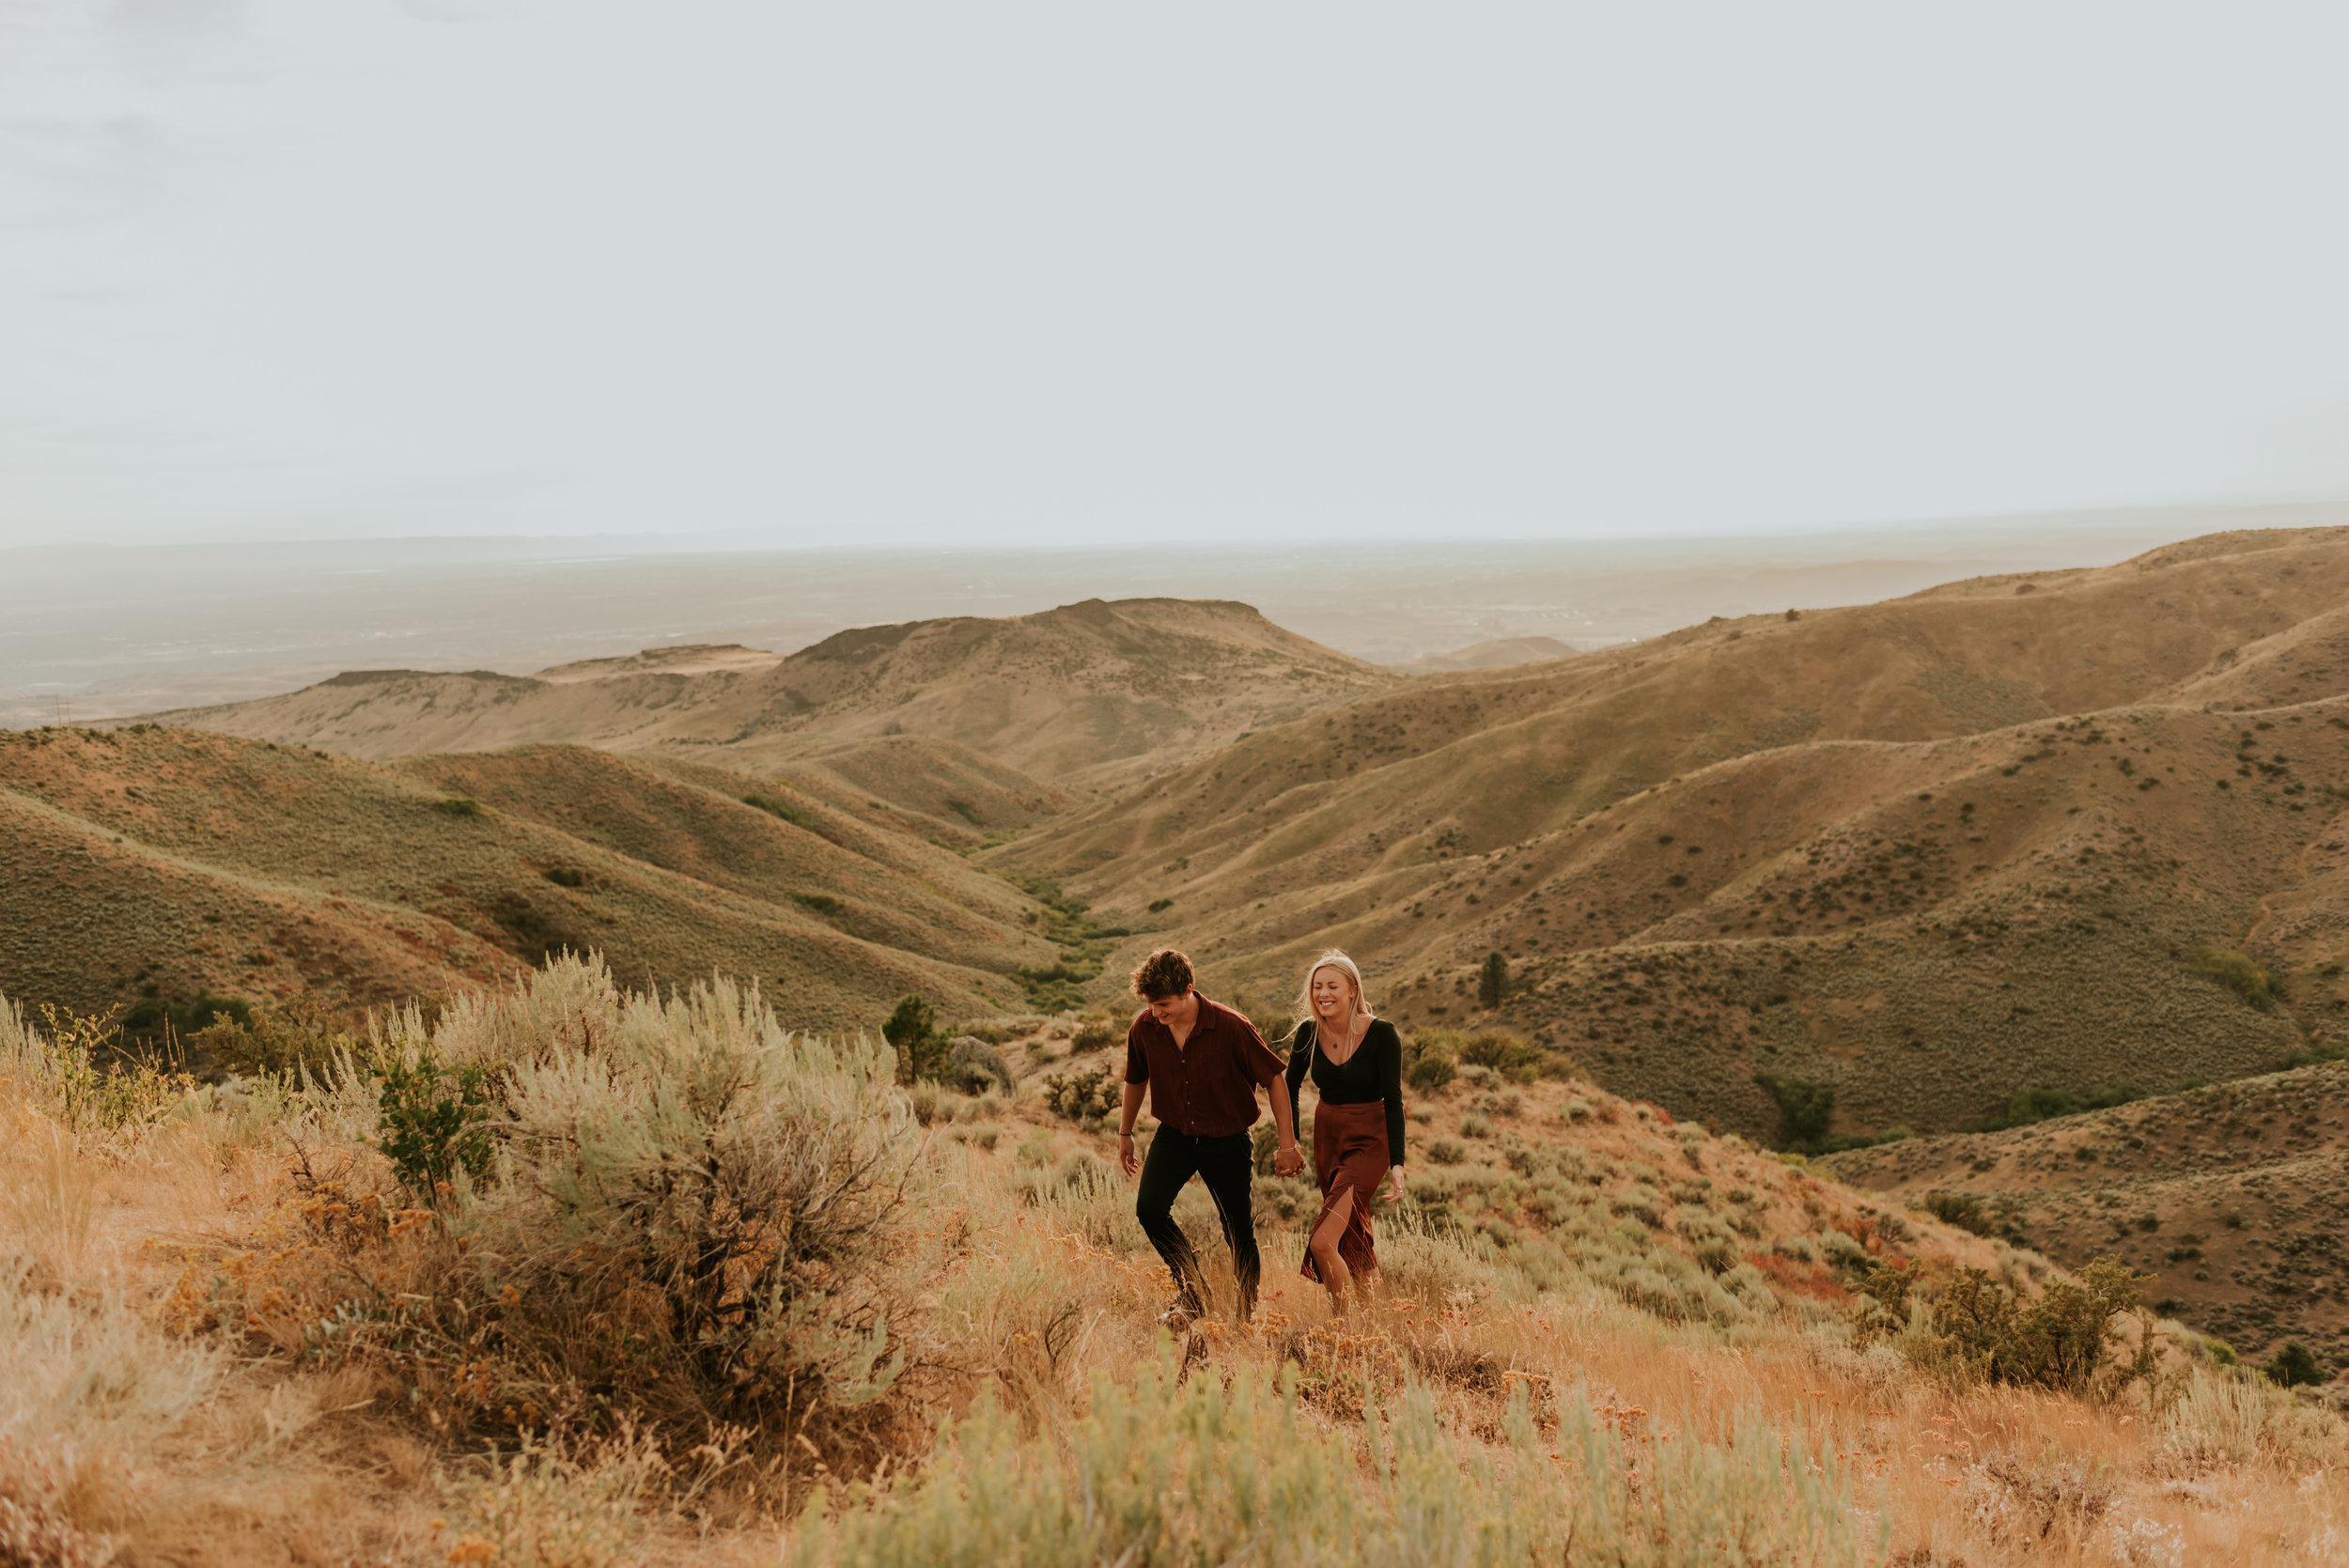 Bogus Basin Couples Session   Boise, Idaho Engagement Photos   Carrie Rogers Photography   Adventurous Couples Session